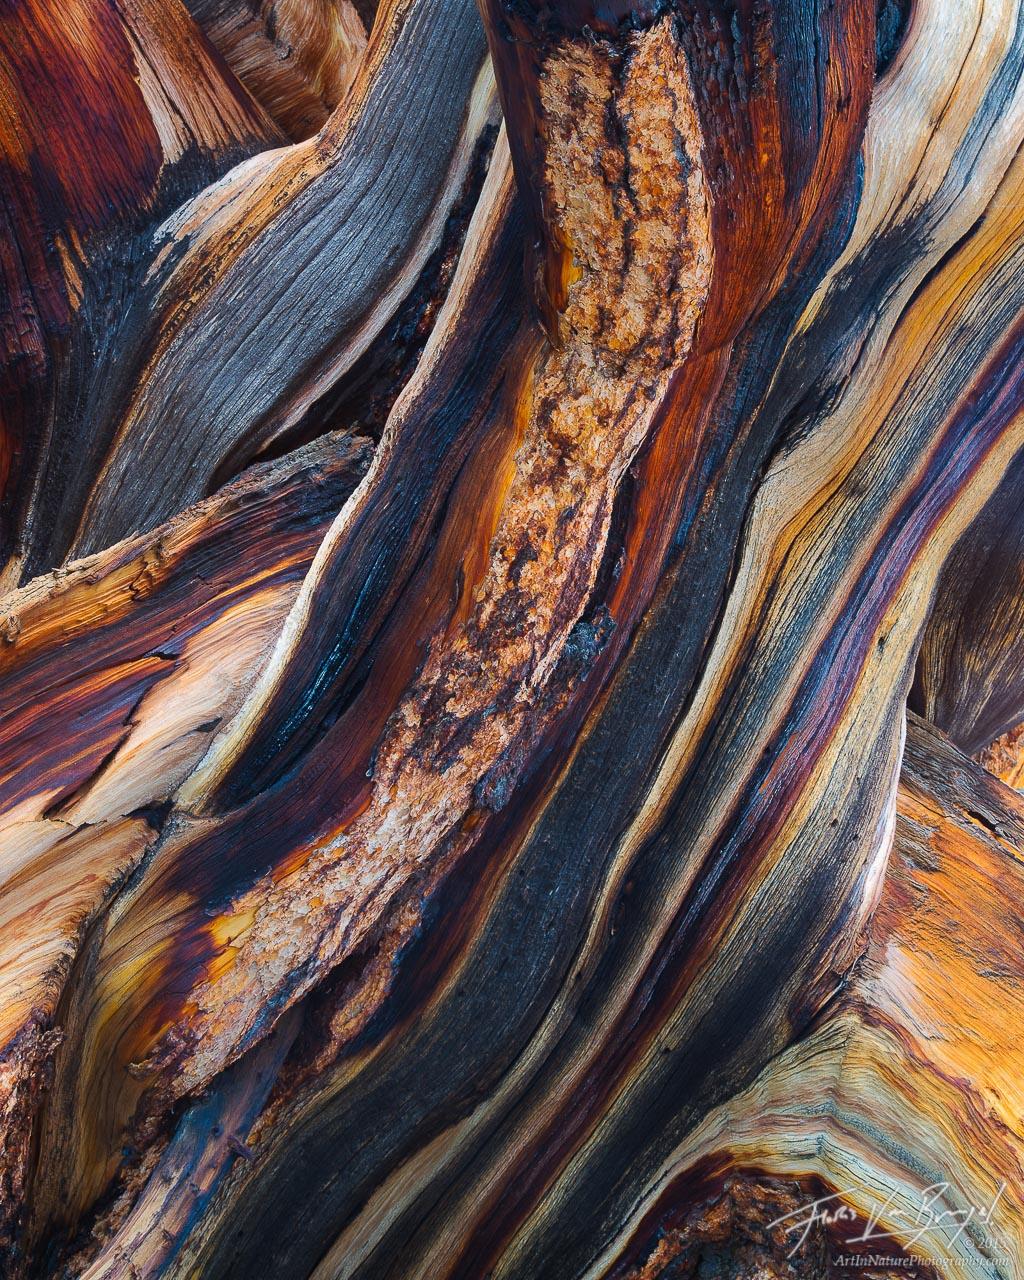 Bristlecone Wood Abstract, White Mountains, California, photo